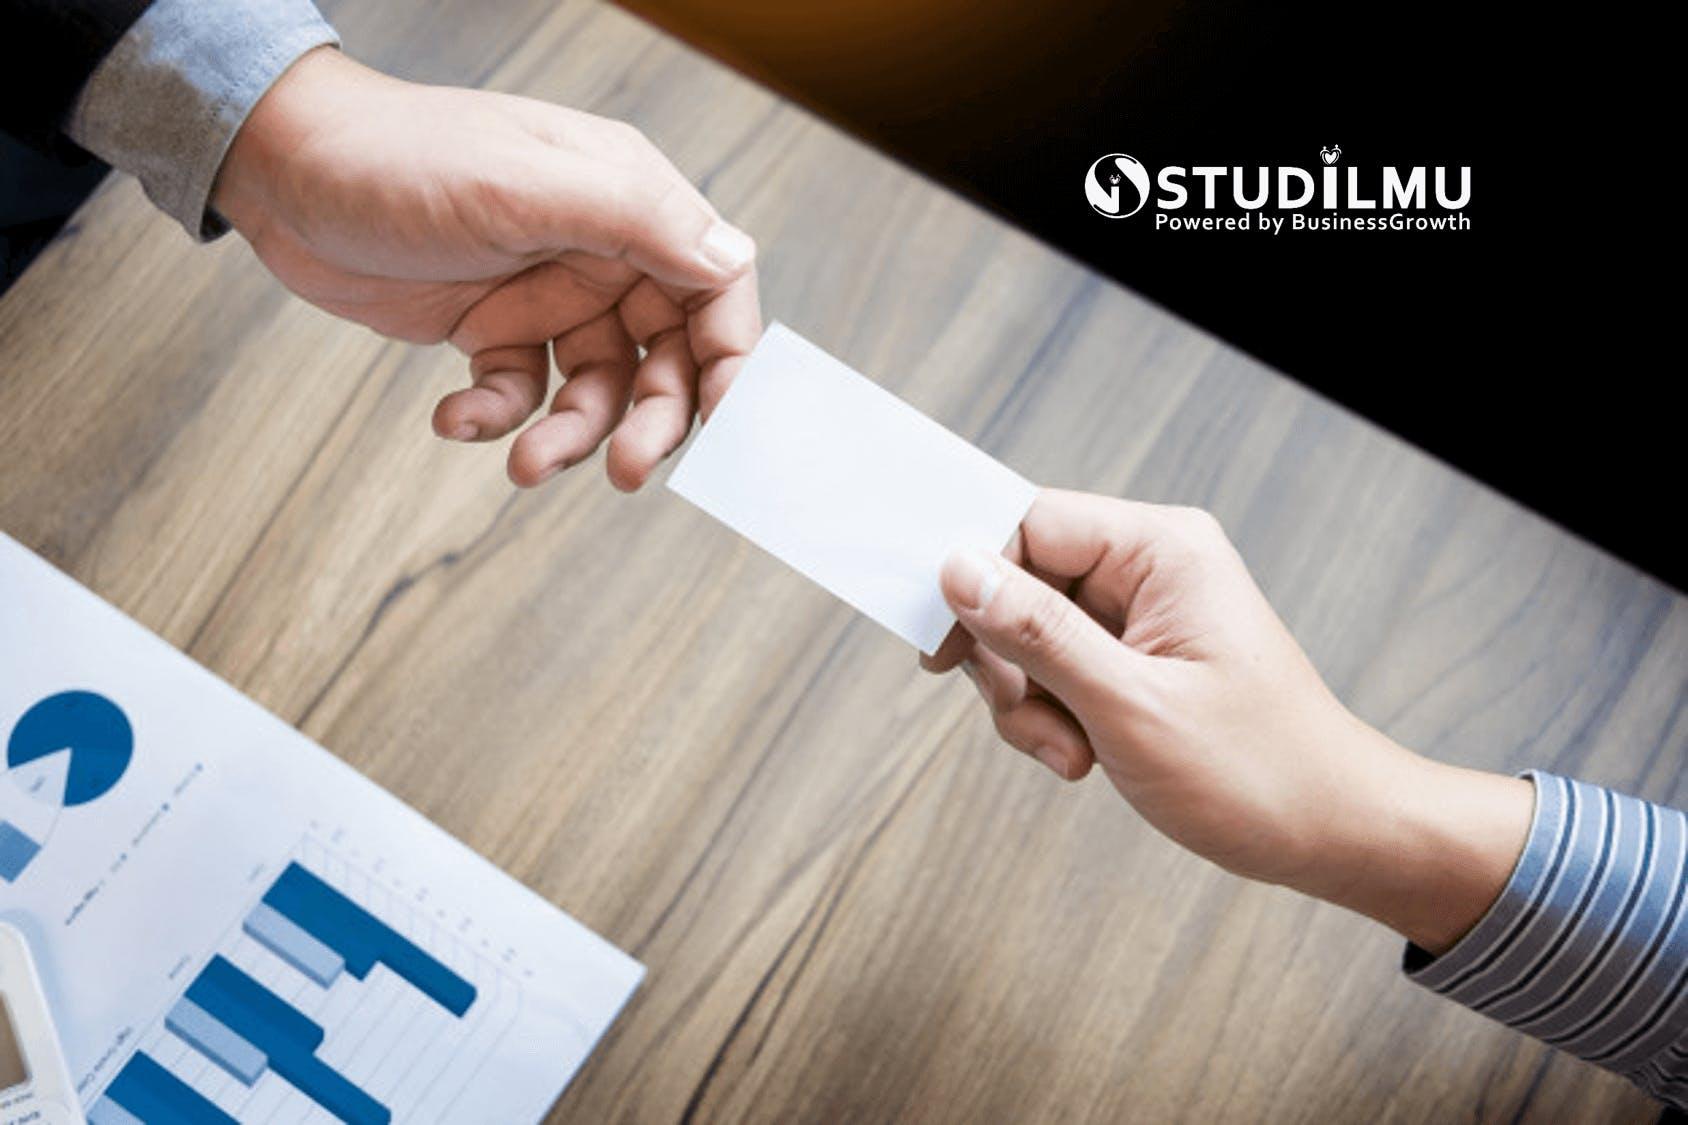 STUDILMU Career Advice - 5 Tips Sukses Berjejaring bagi Pemula